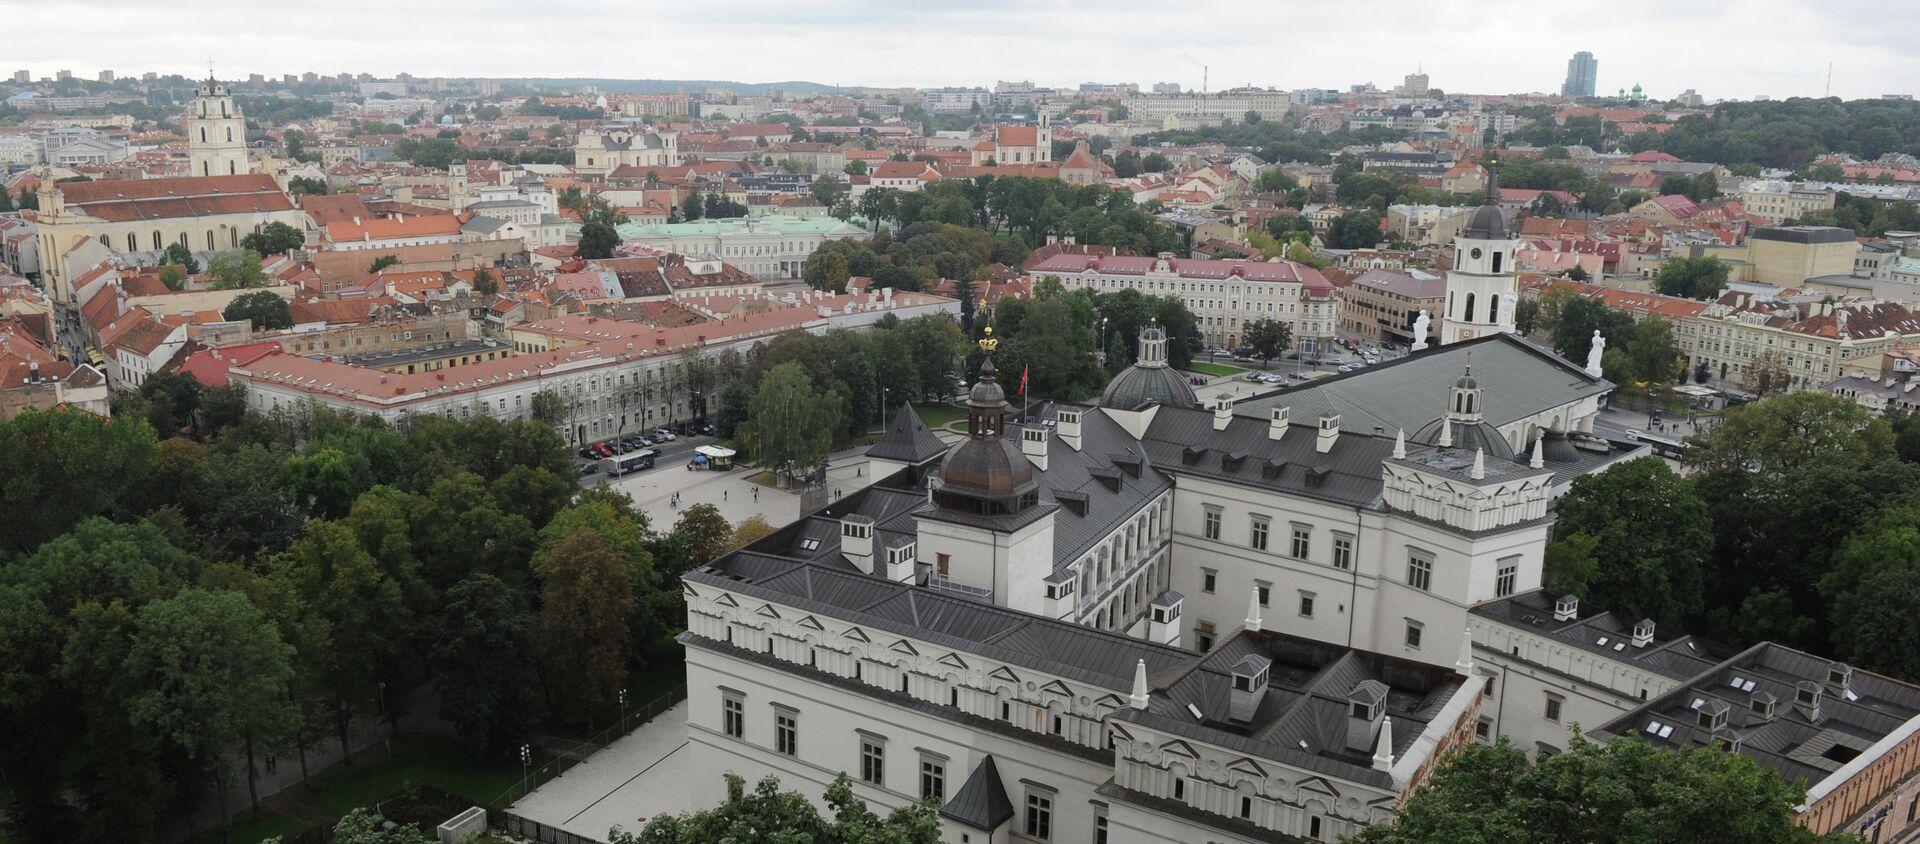 Wilno, stolica Litwy - Sputnik Polska, 1920, 02.05.2021